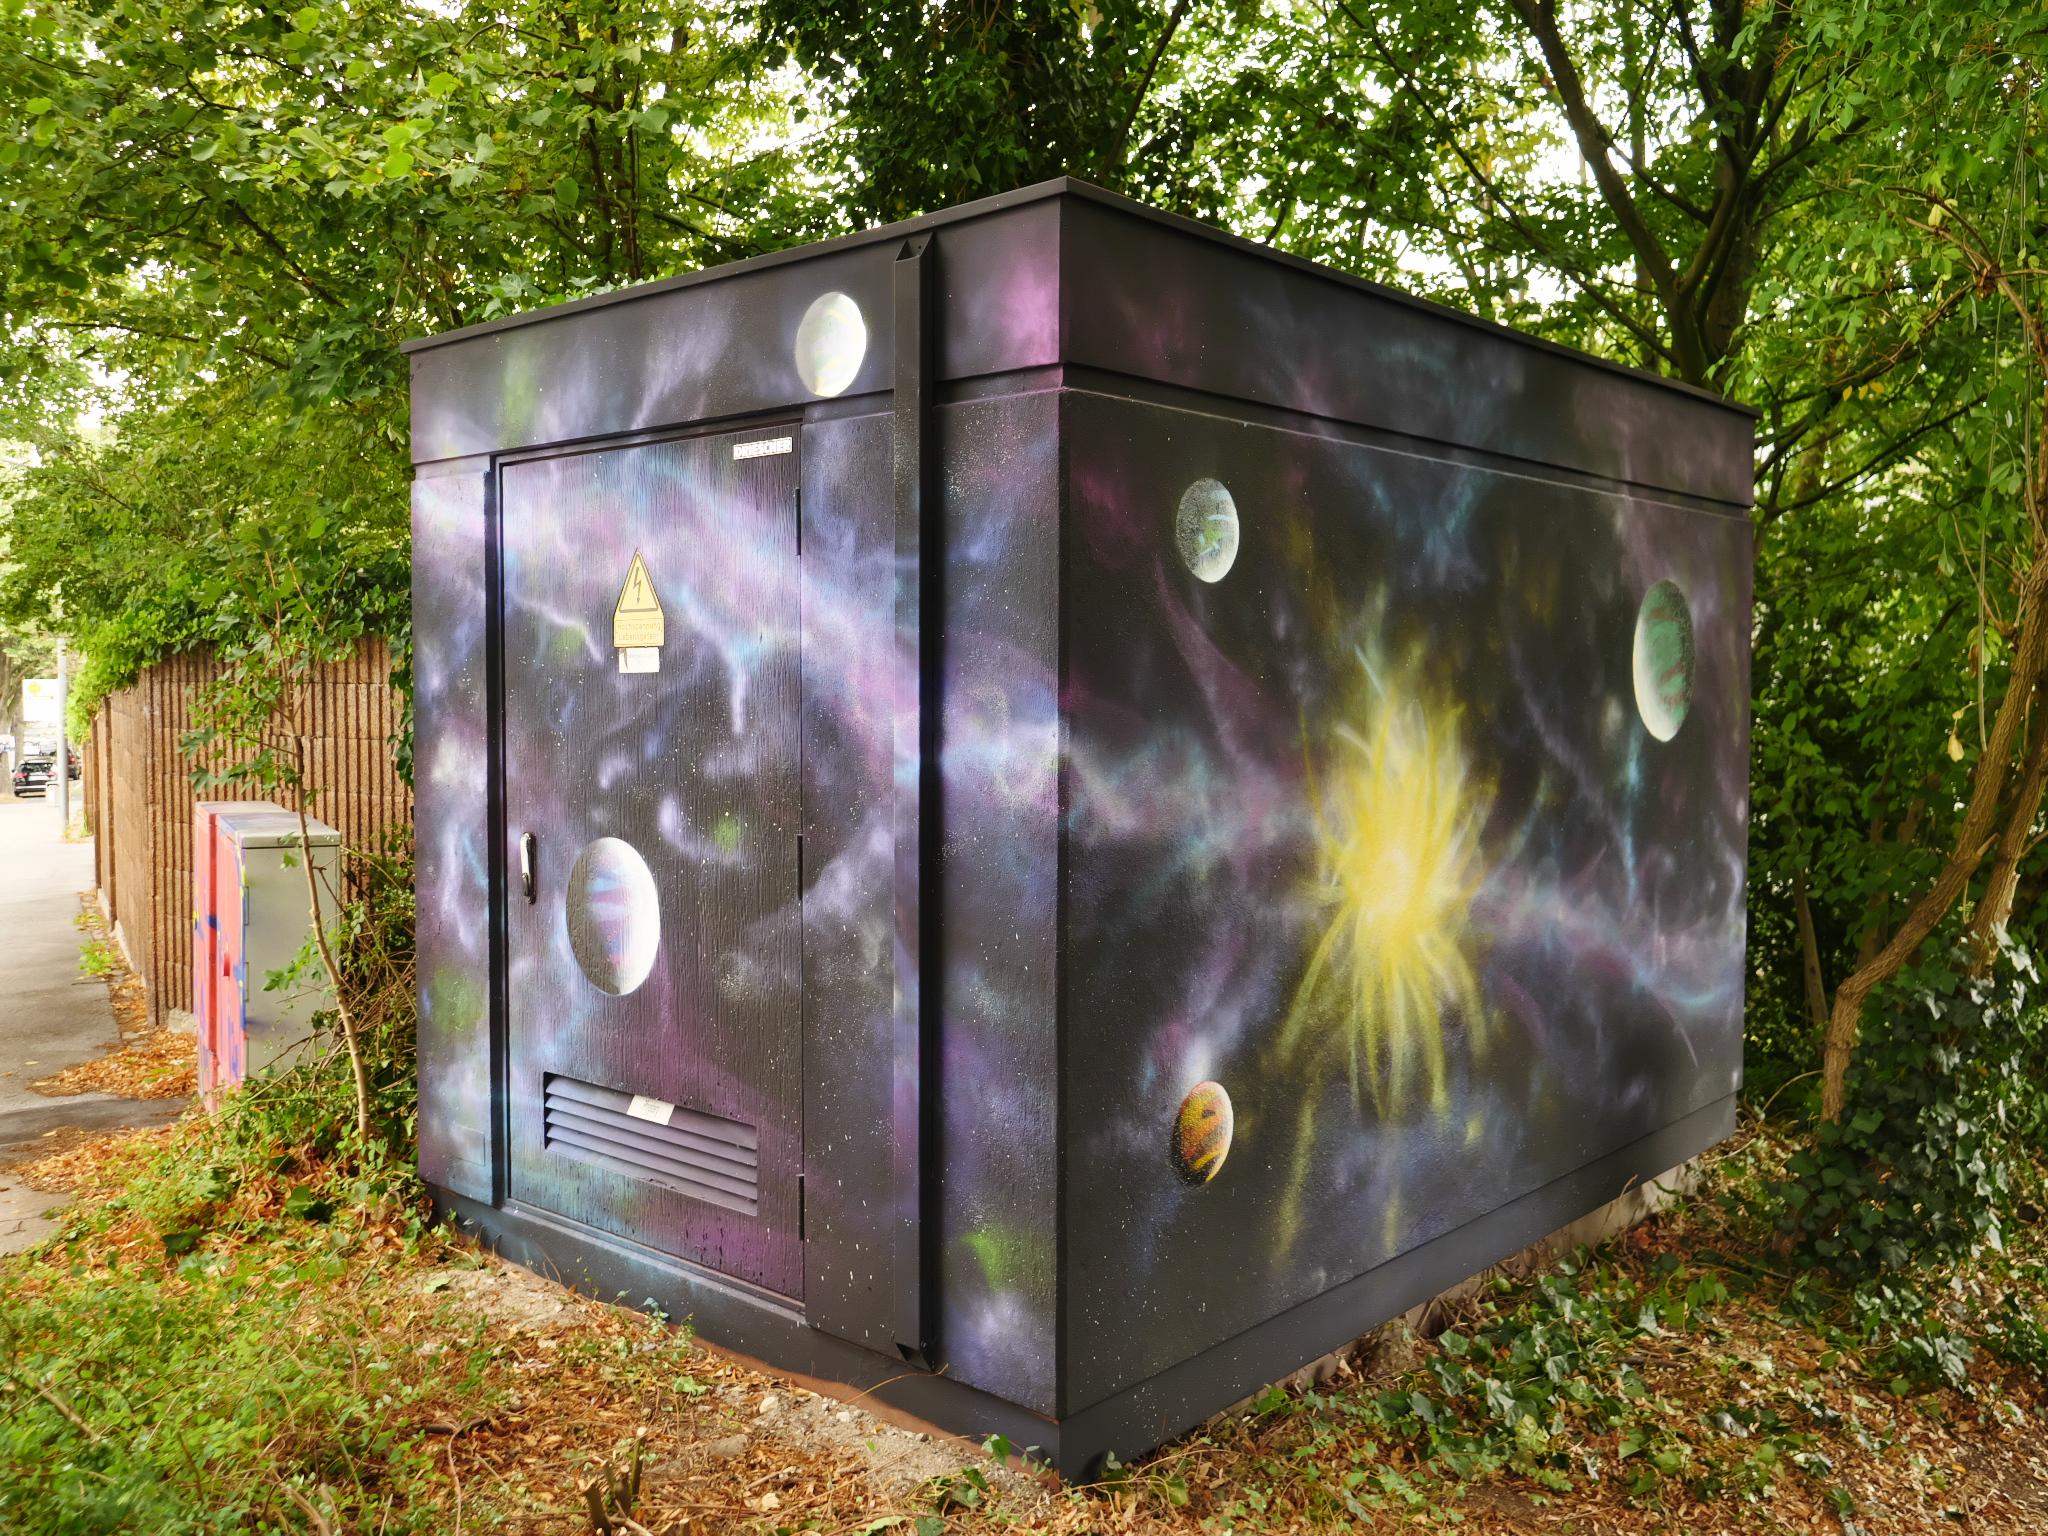 jugendkulturjahr-ratingen-jkj-2020-Street Art Map-Lost in Space Pt I 1